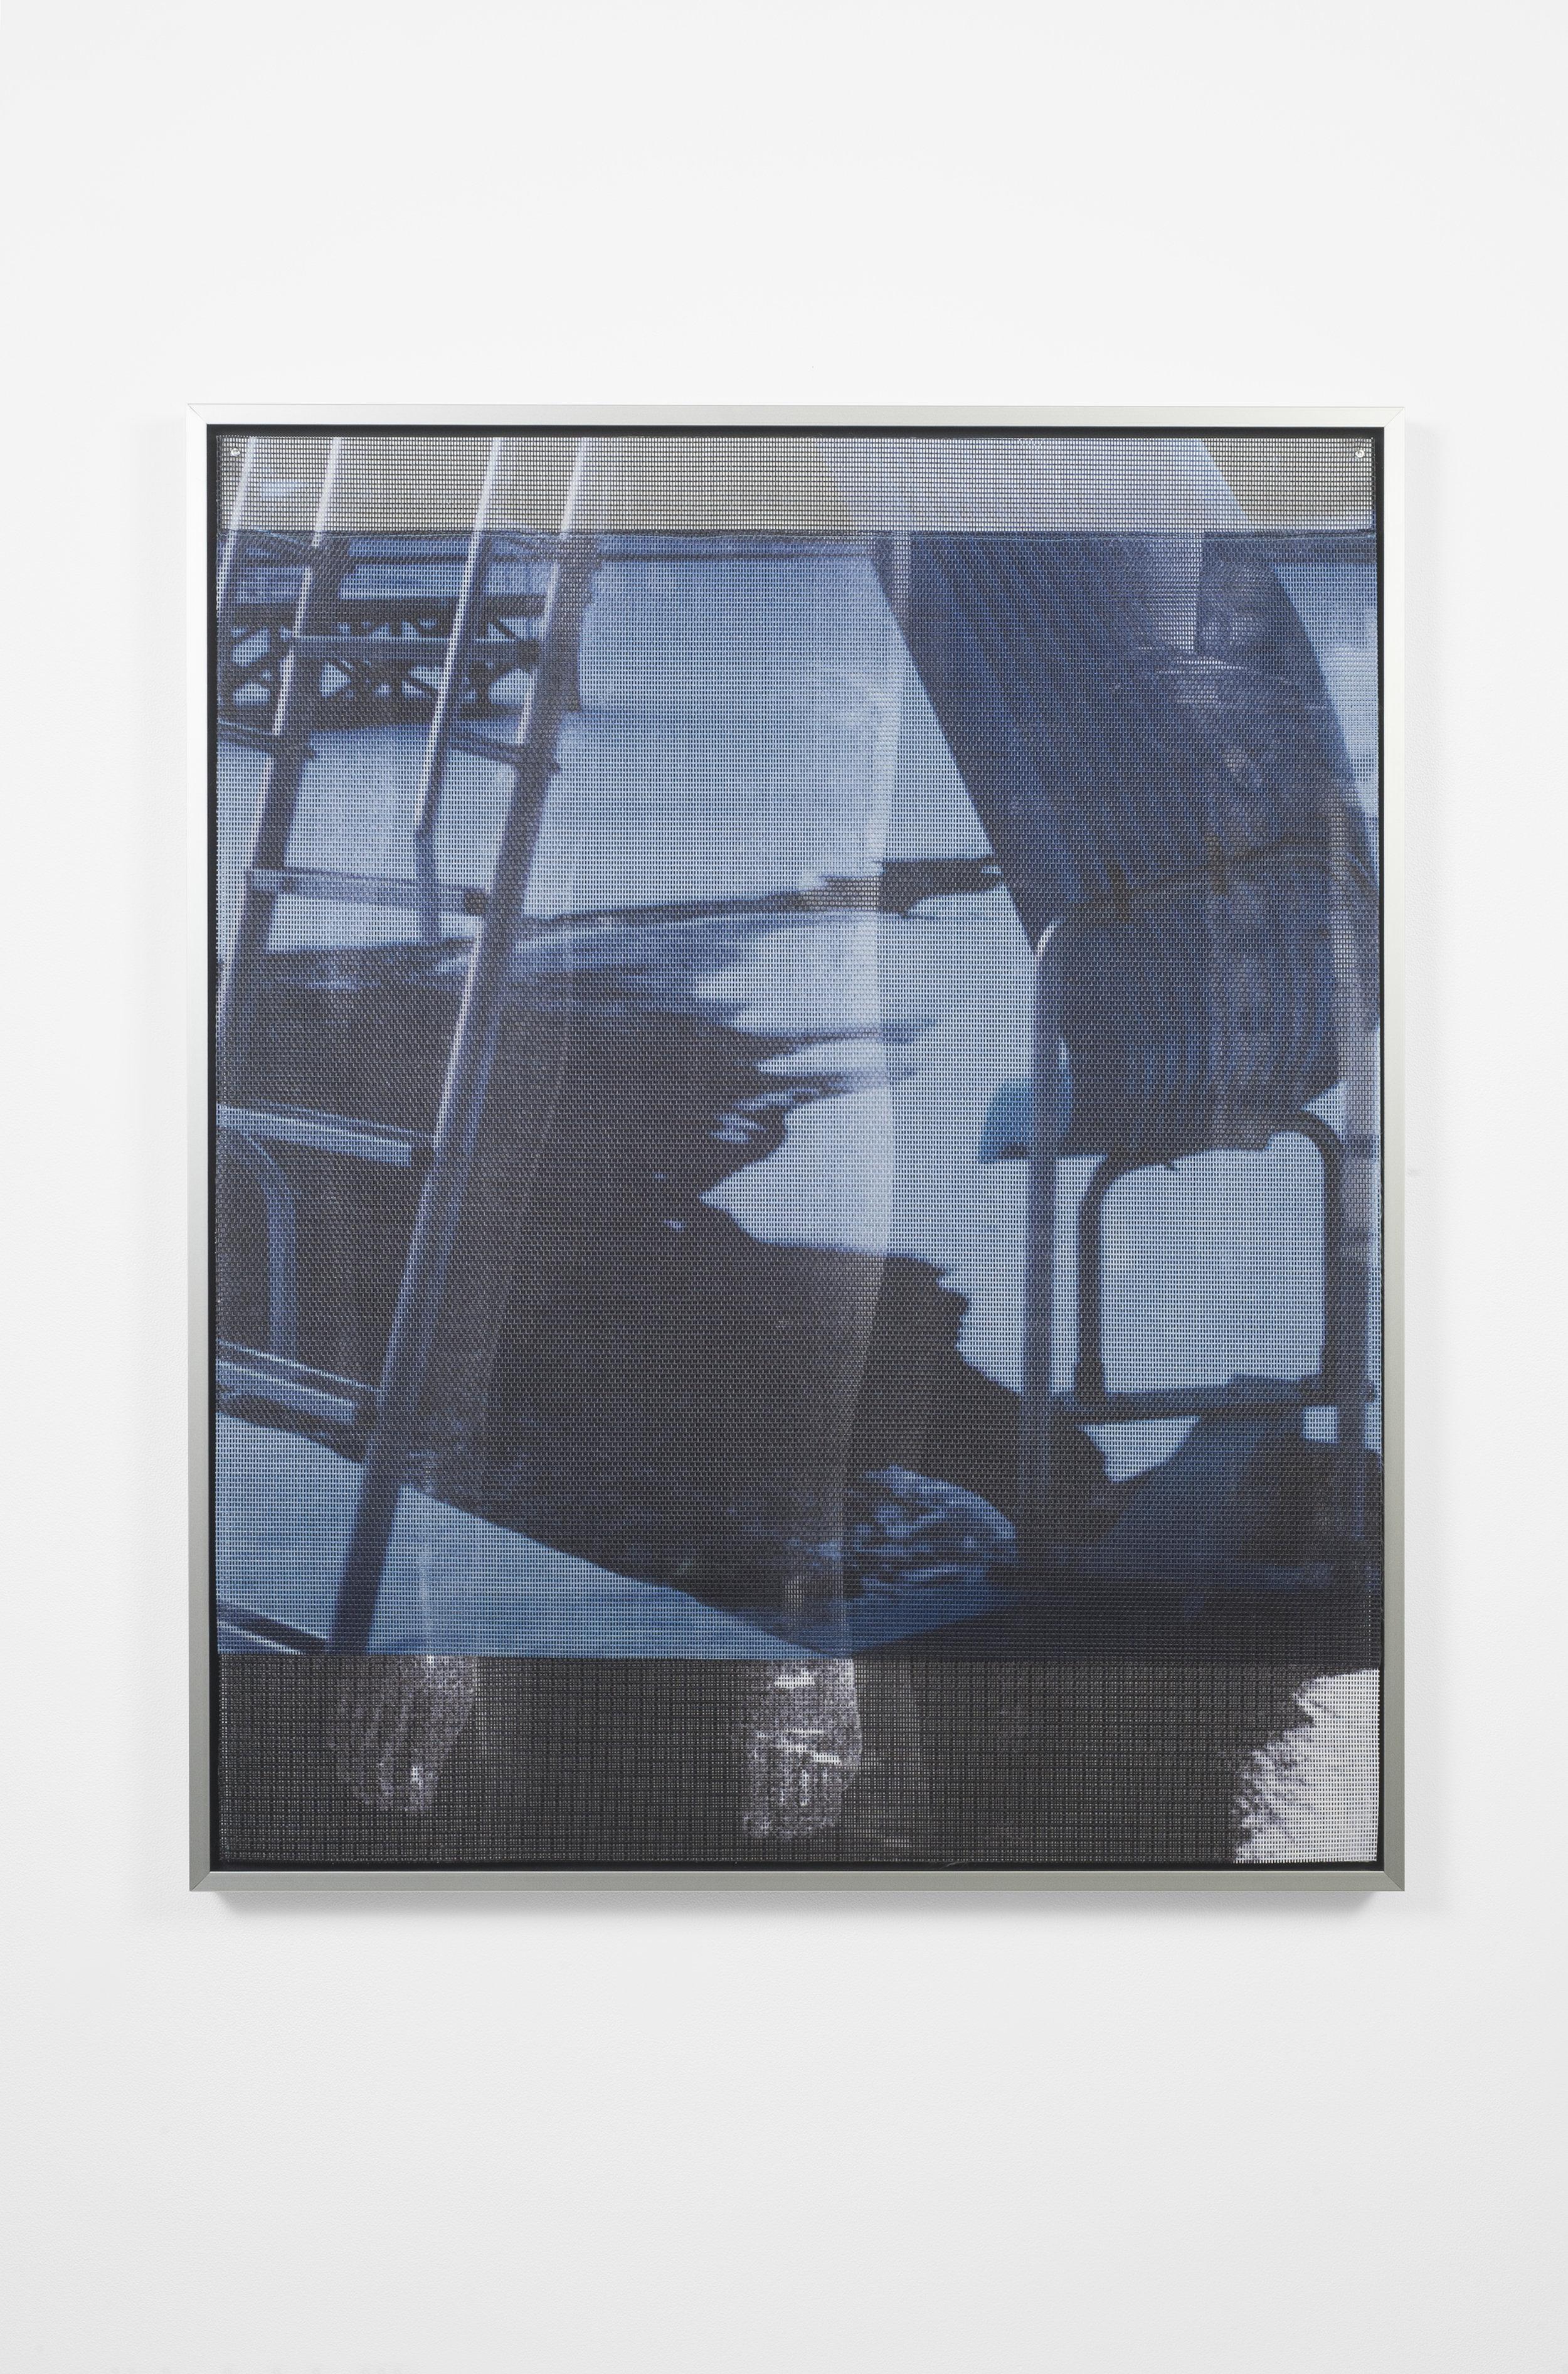 Ellie Hunter,  Syndrome of Subjective Doubles ii,  2019, UV inkjet print on vinyl mesh, 24.4 x 31.5 inches